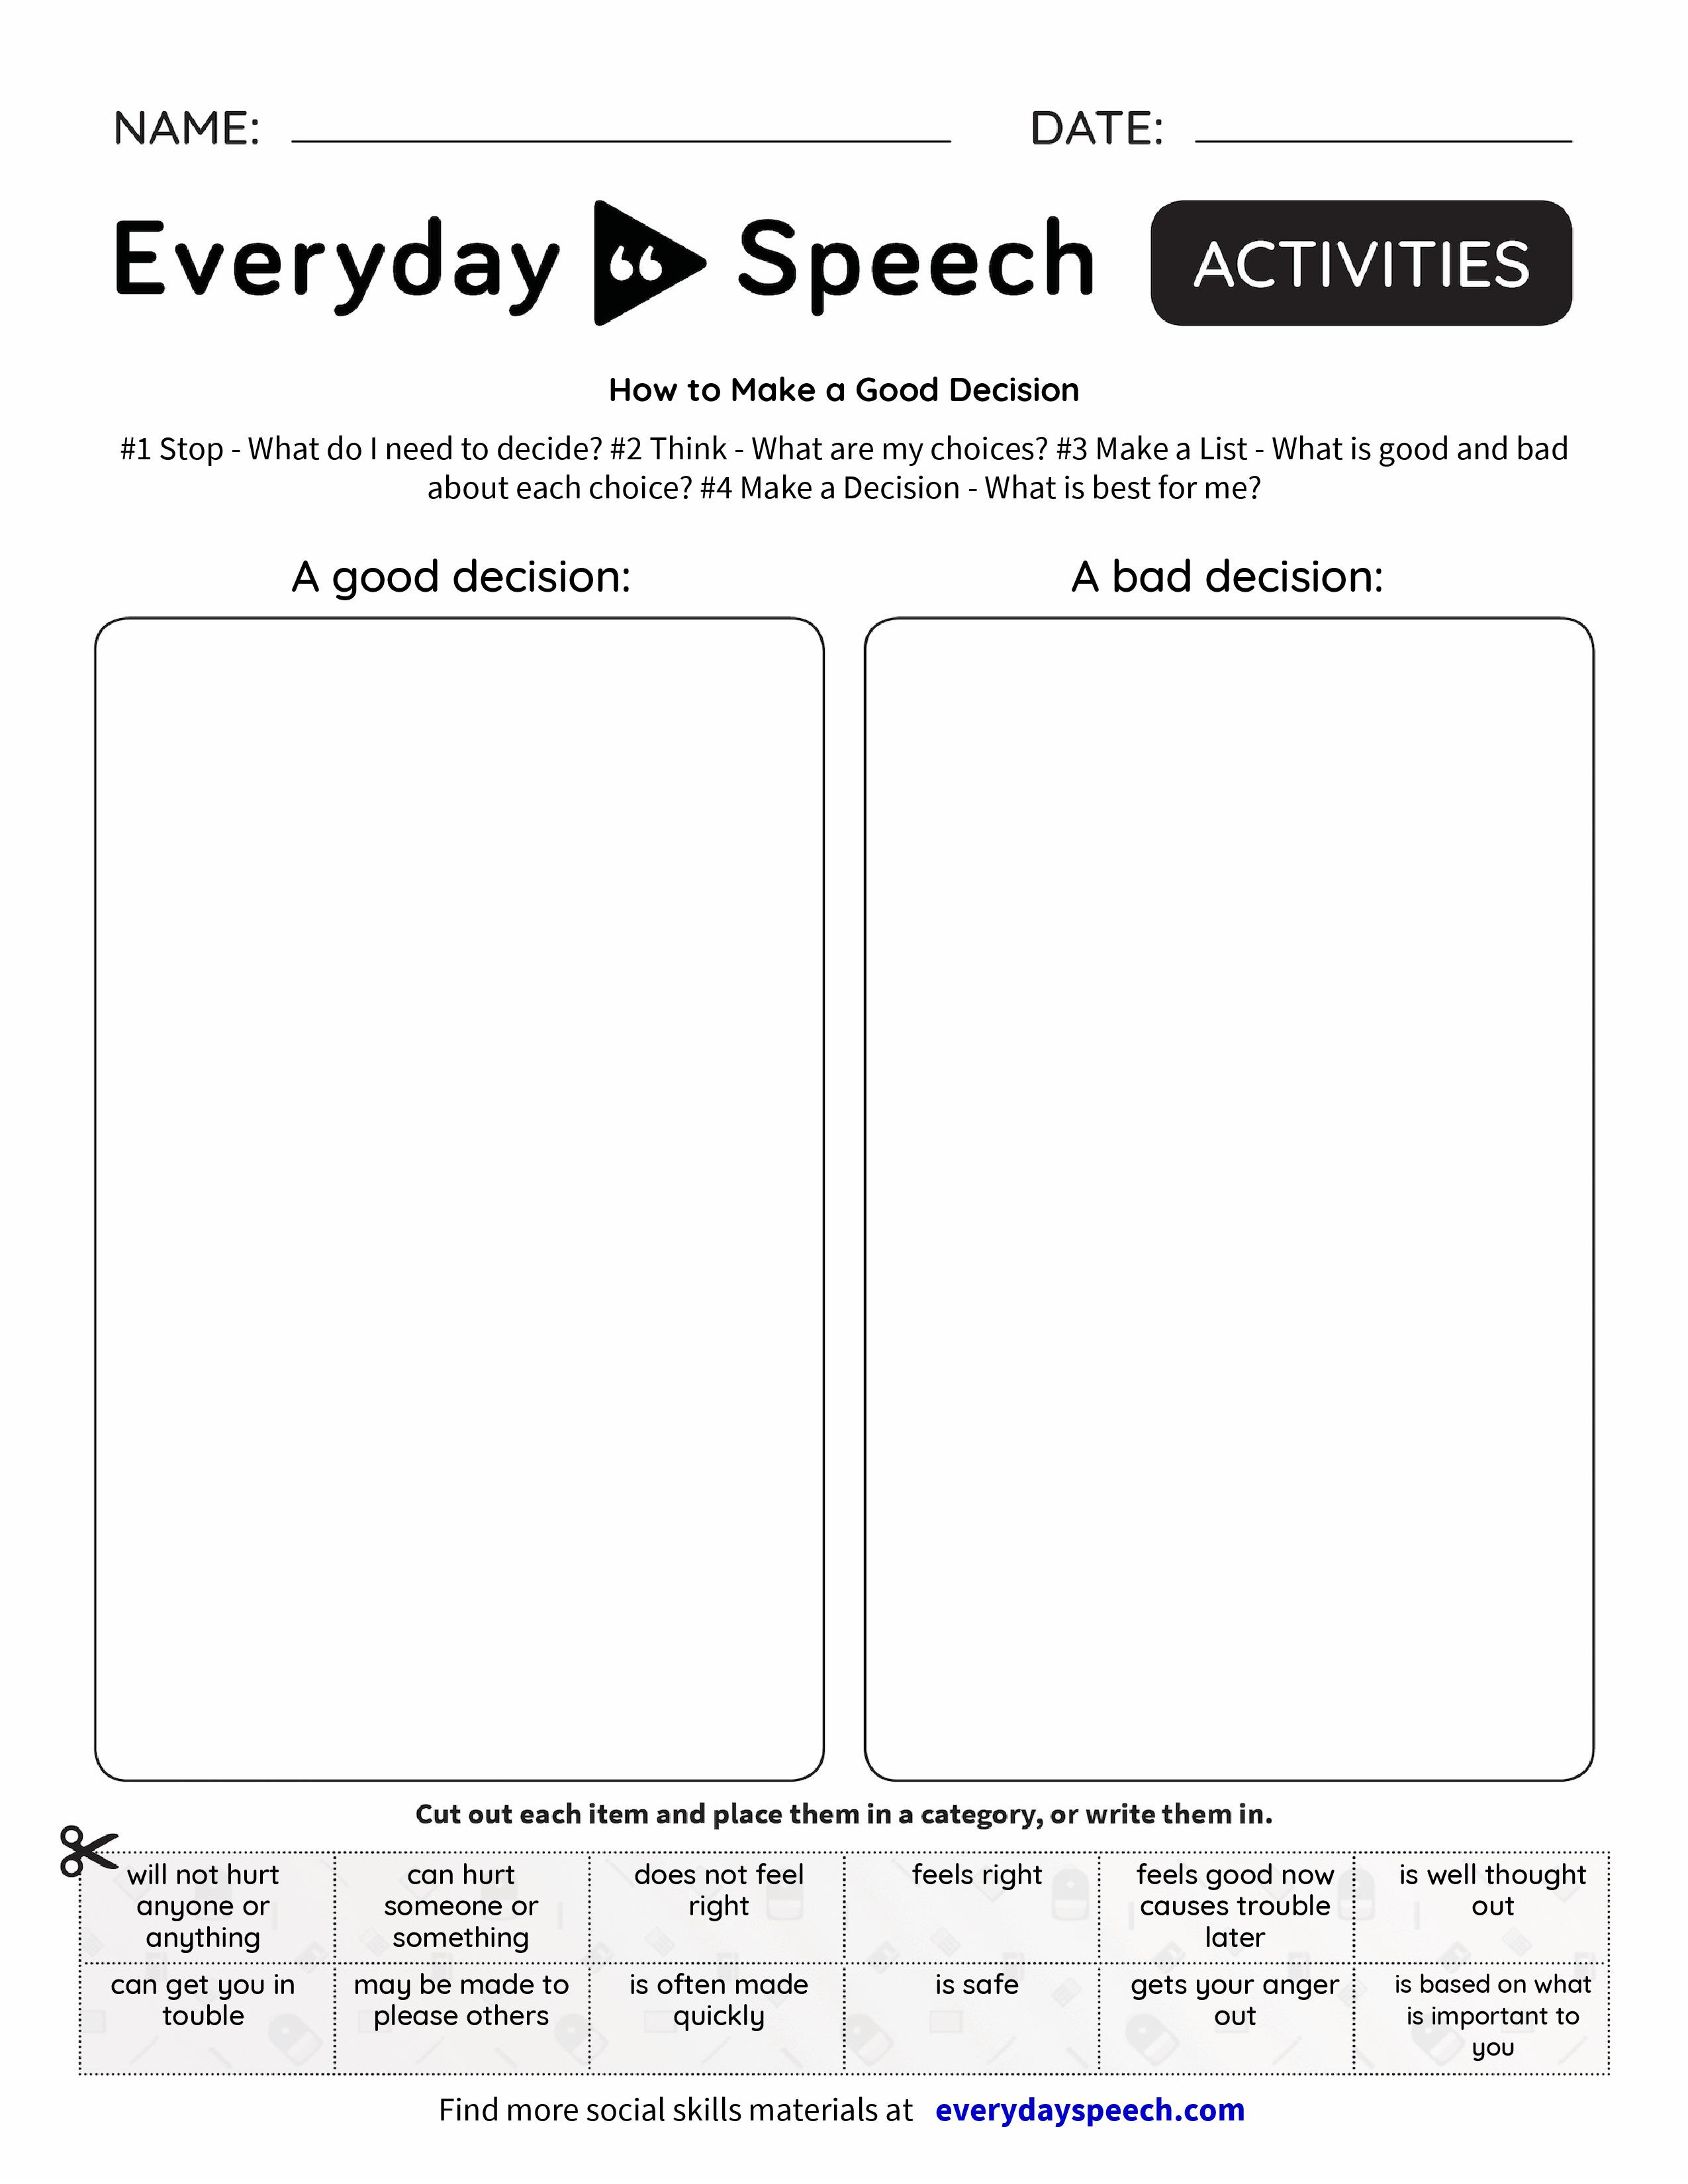 How To Make A Good Decision Everyday Speech Everyday